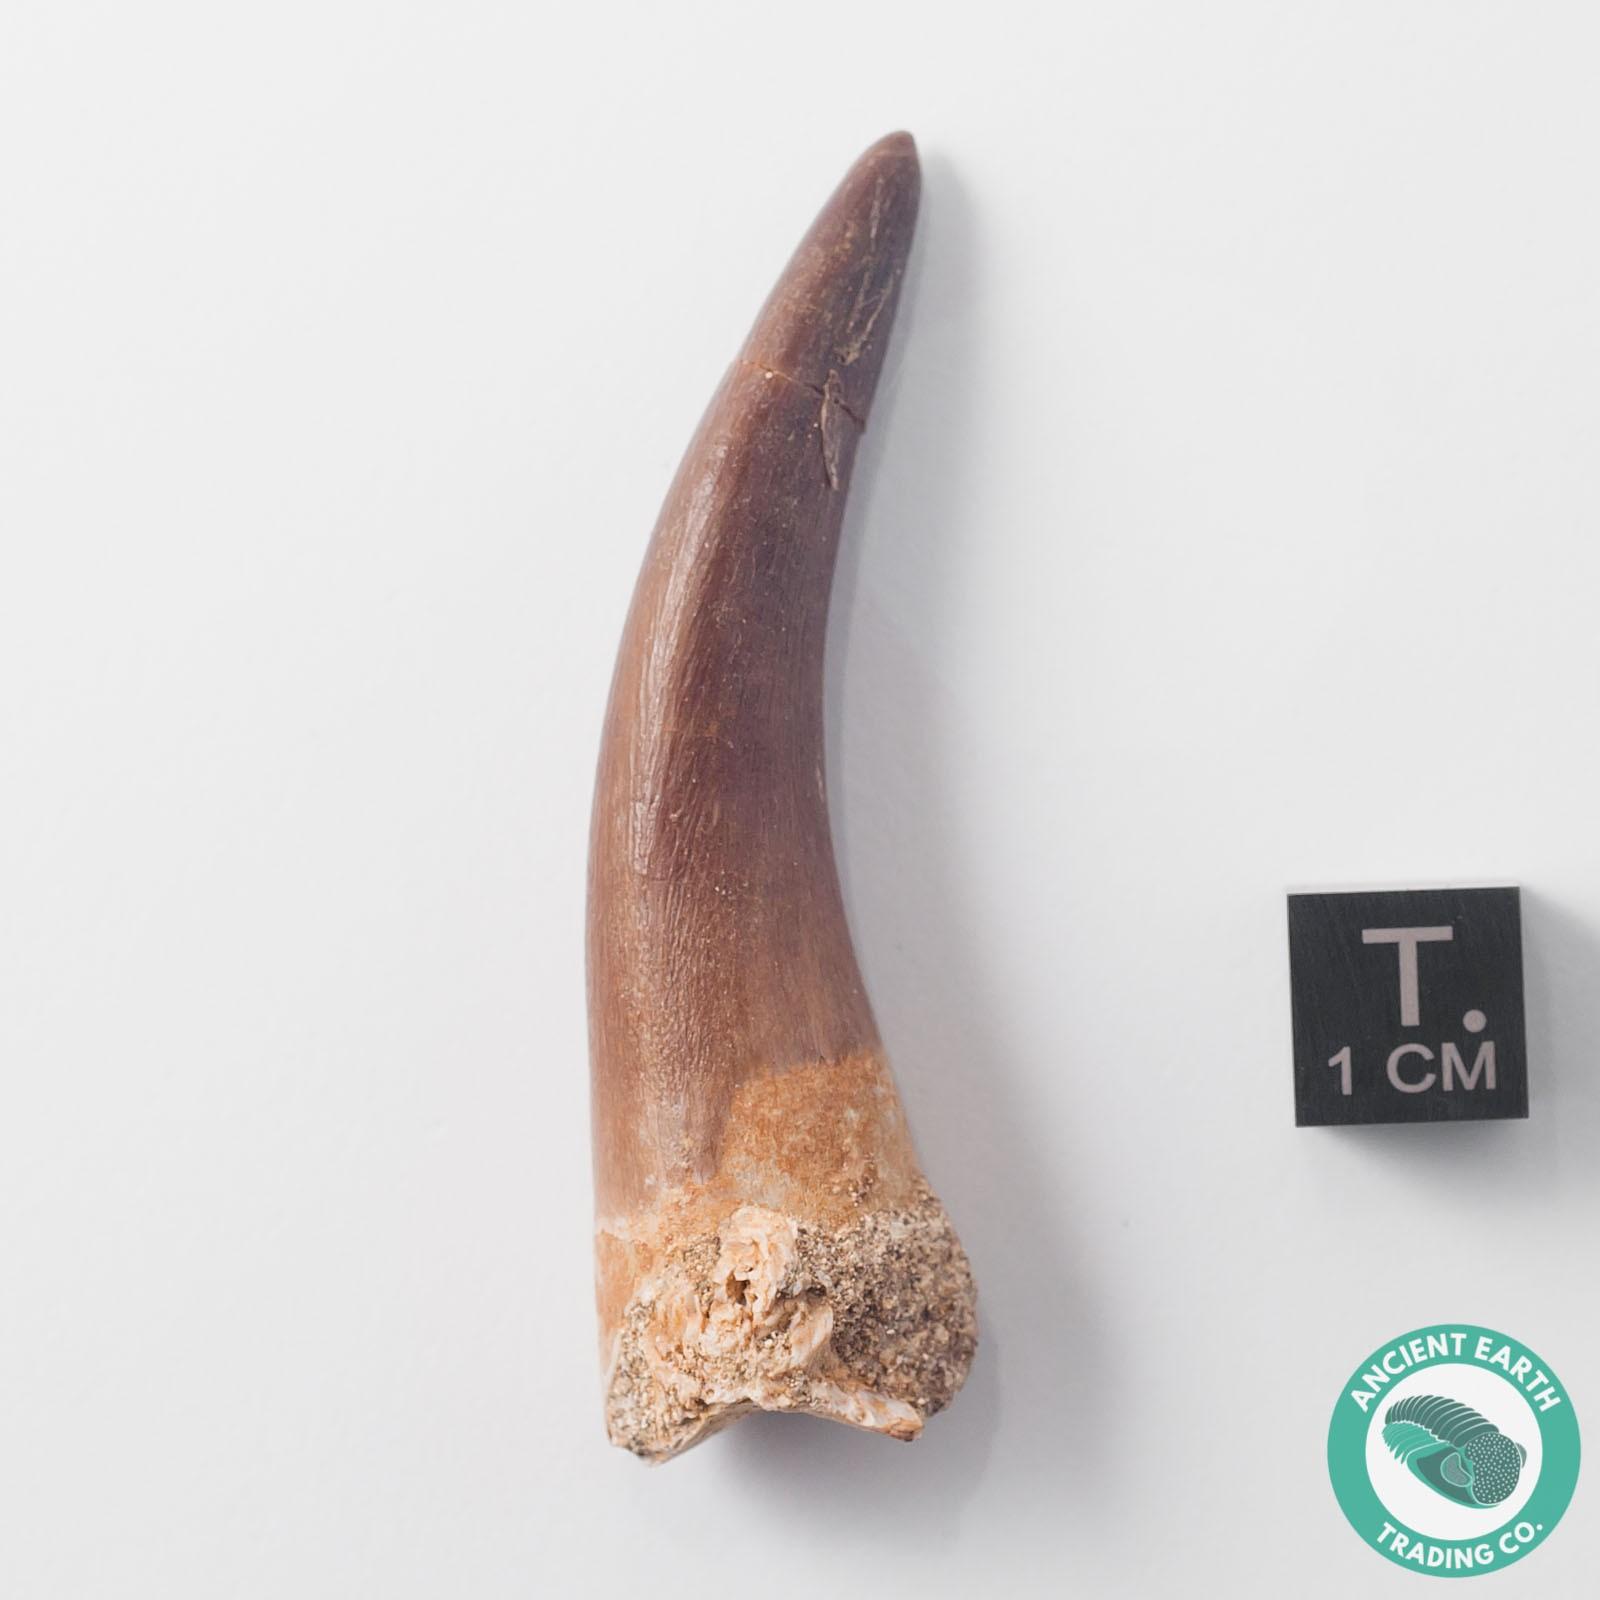 2.34 in. Unerupted Plesiosaur Zarafasaura Fossil Tooth - Morocco